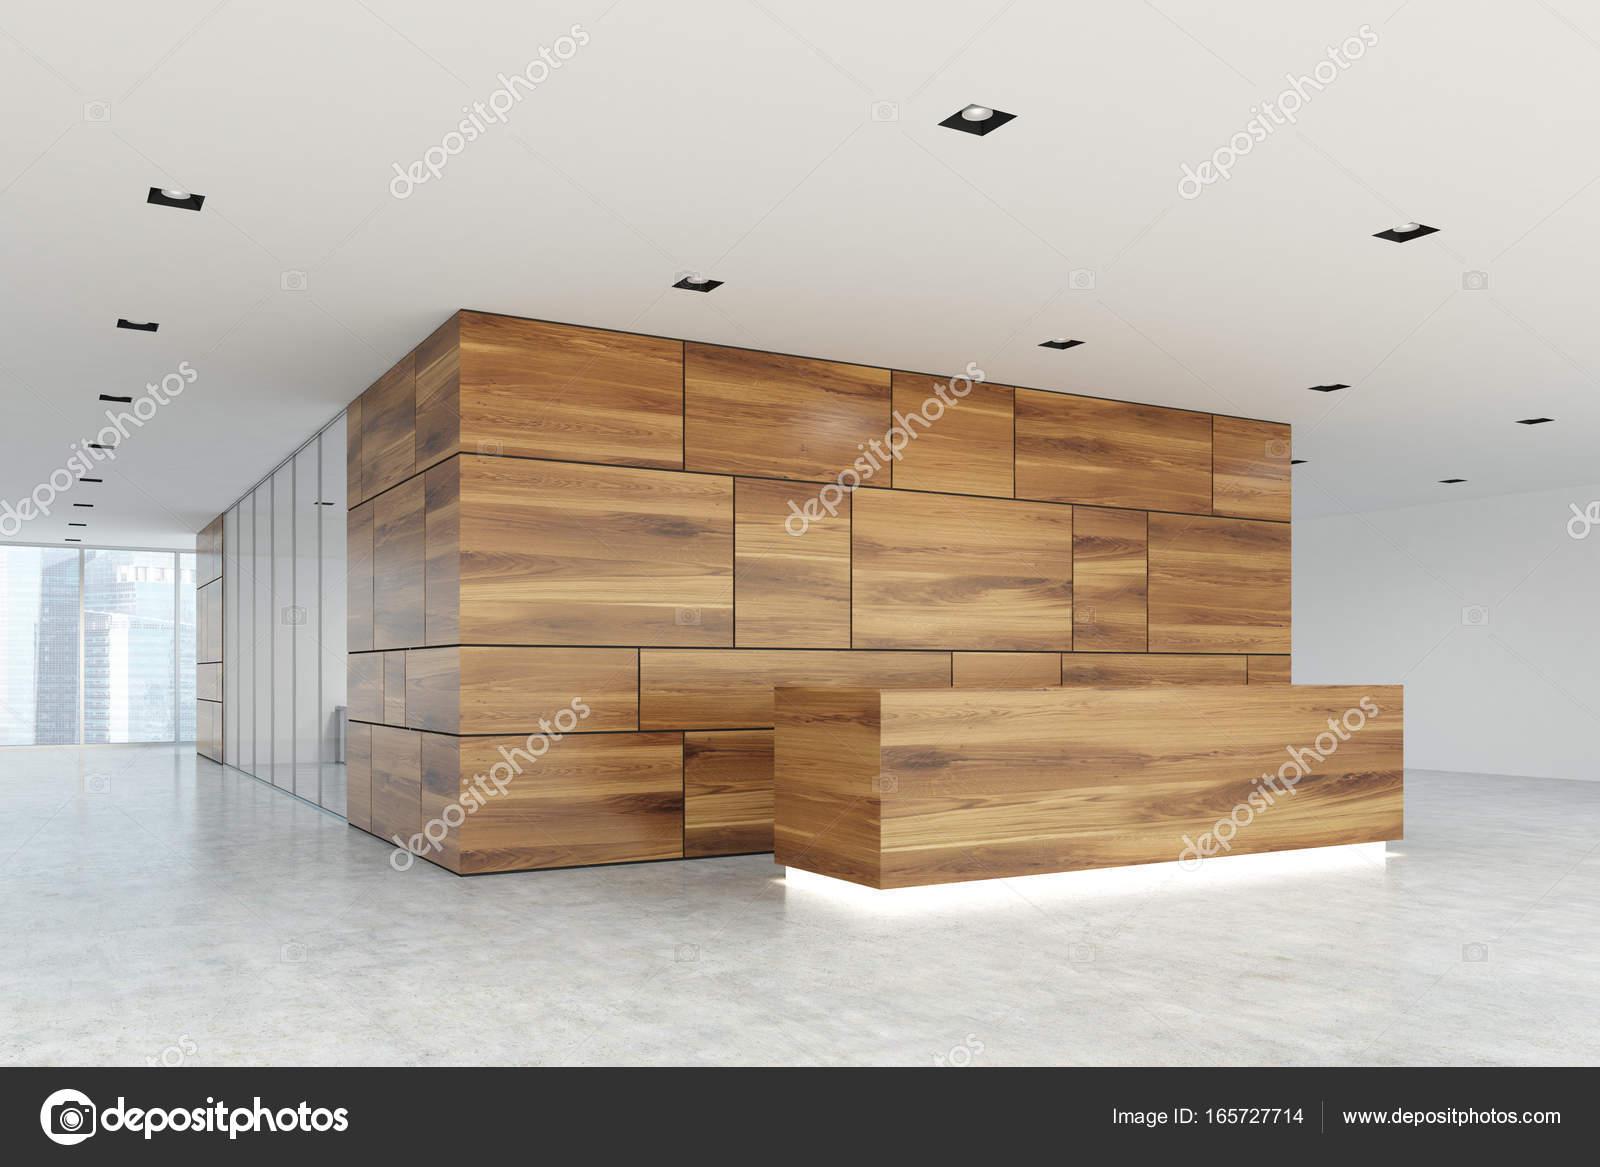 Aus Holz und Glas Rezeption Lobby Closeup, Seite — Stockfoto ...